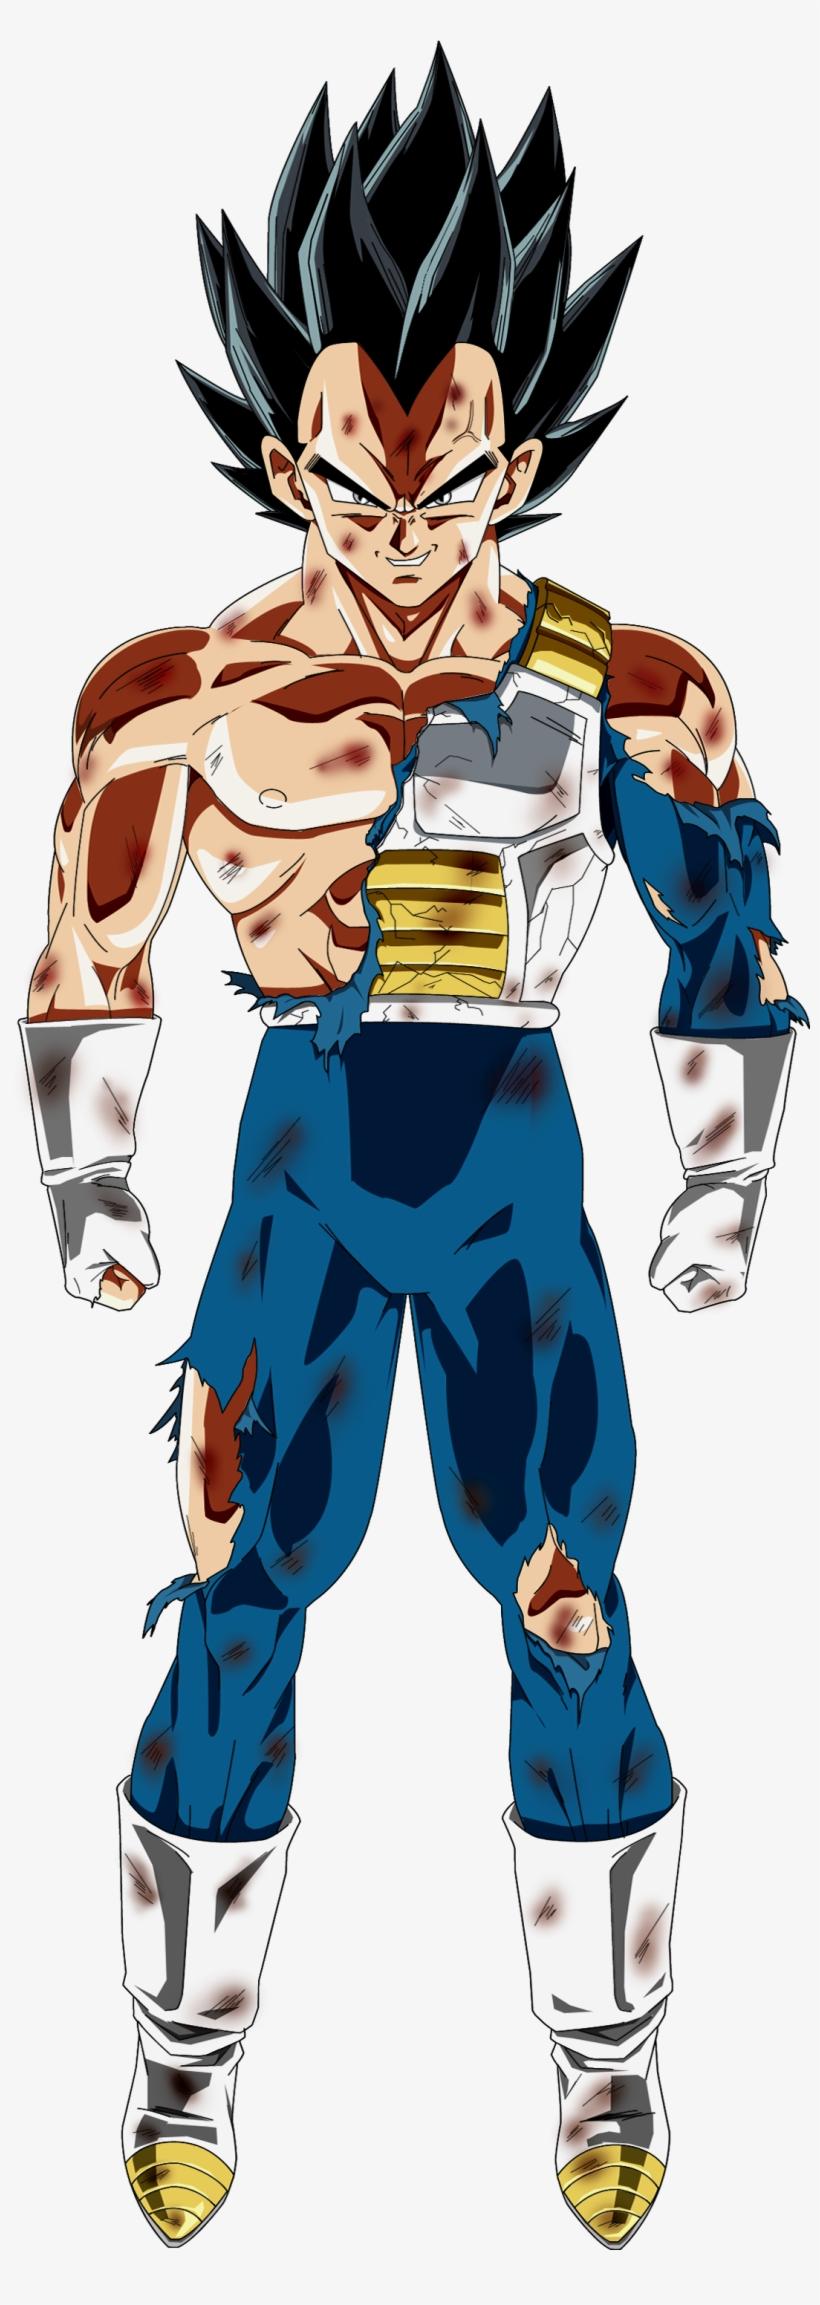 Resultado De Imagen Para Vegeta Ultra Instinct Hd Wallpaper Mastered Ultra Instinct Goku Power Level Transparent Png 2400x3000 Free Download On Nicepng